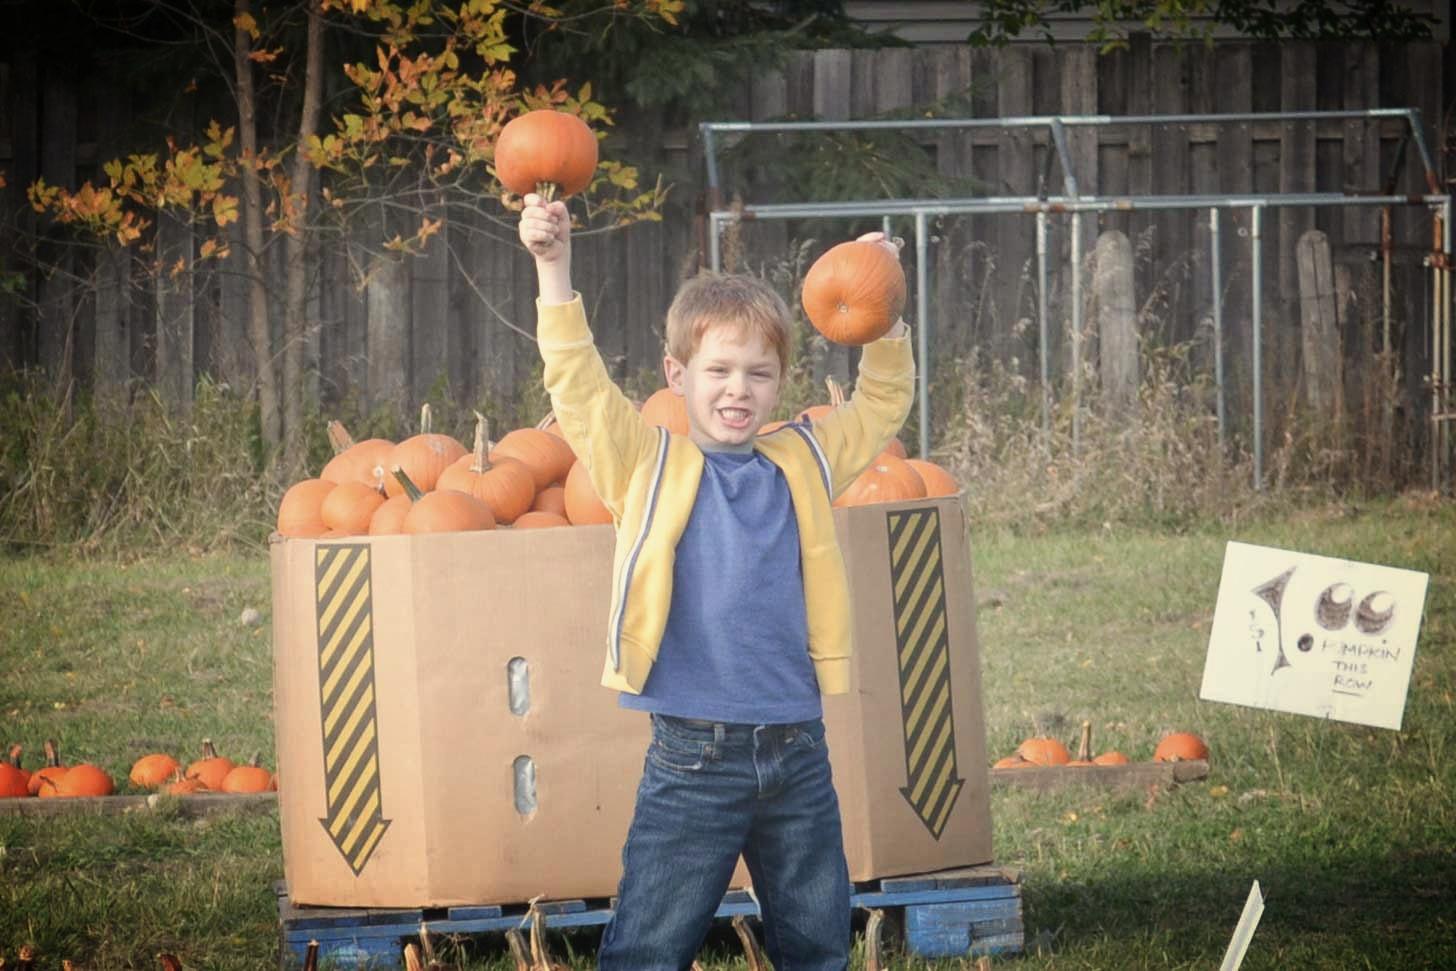 Ryan scores some $1 pumpkins